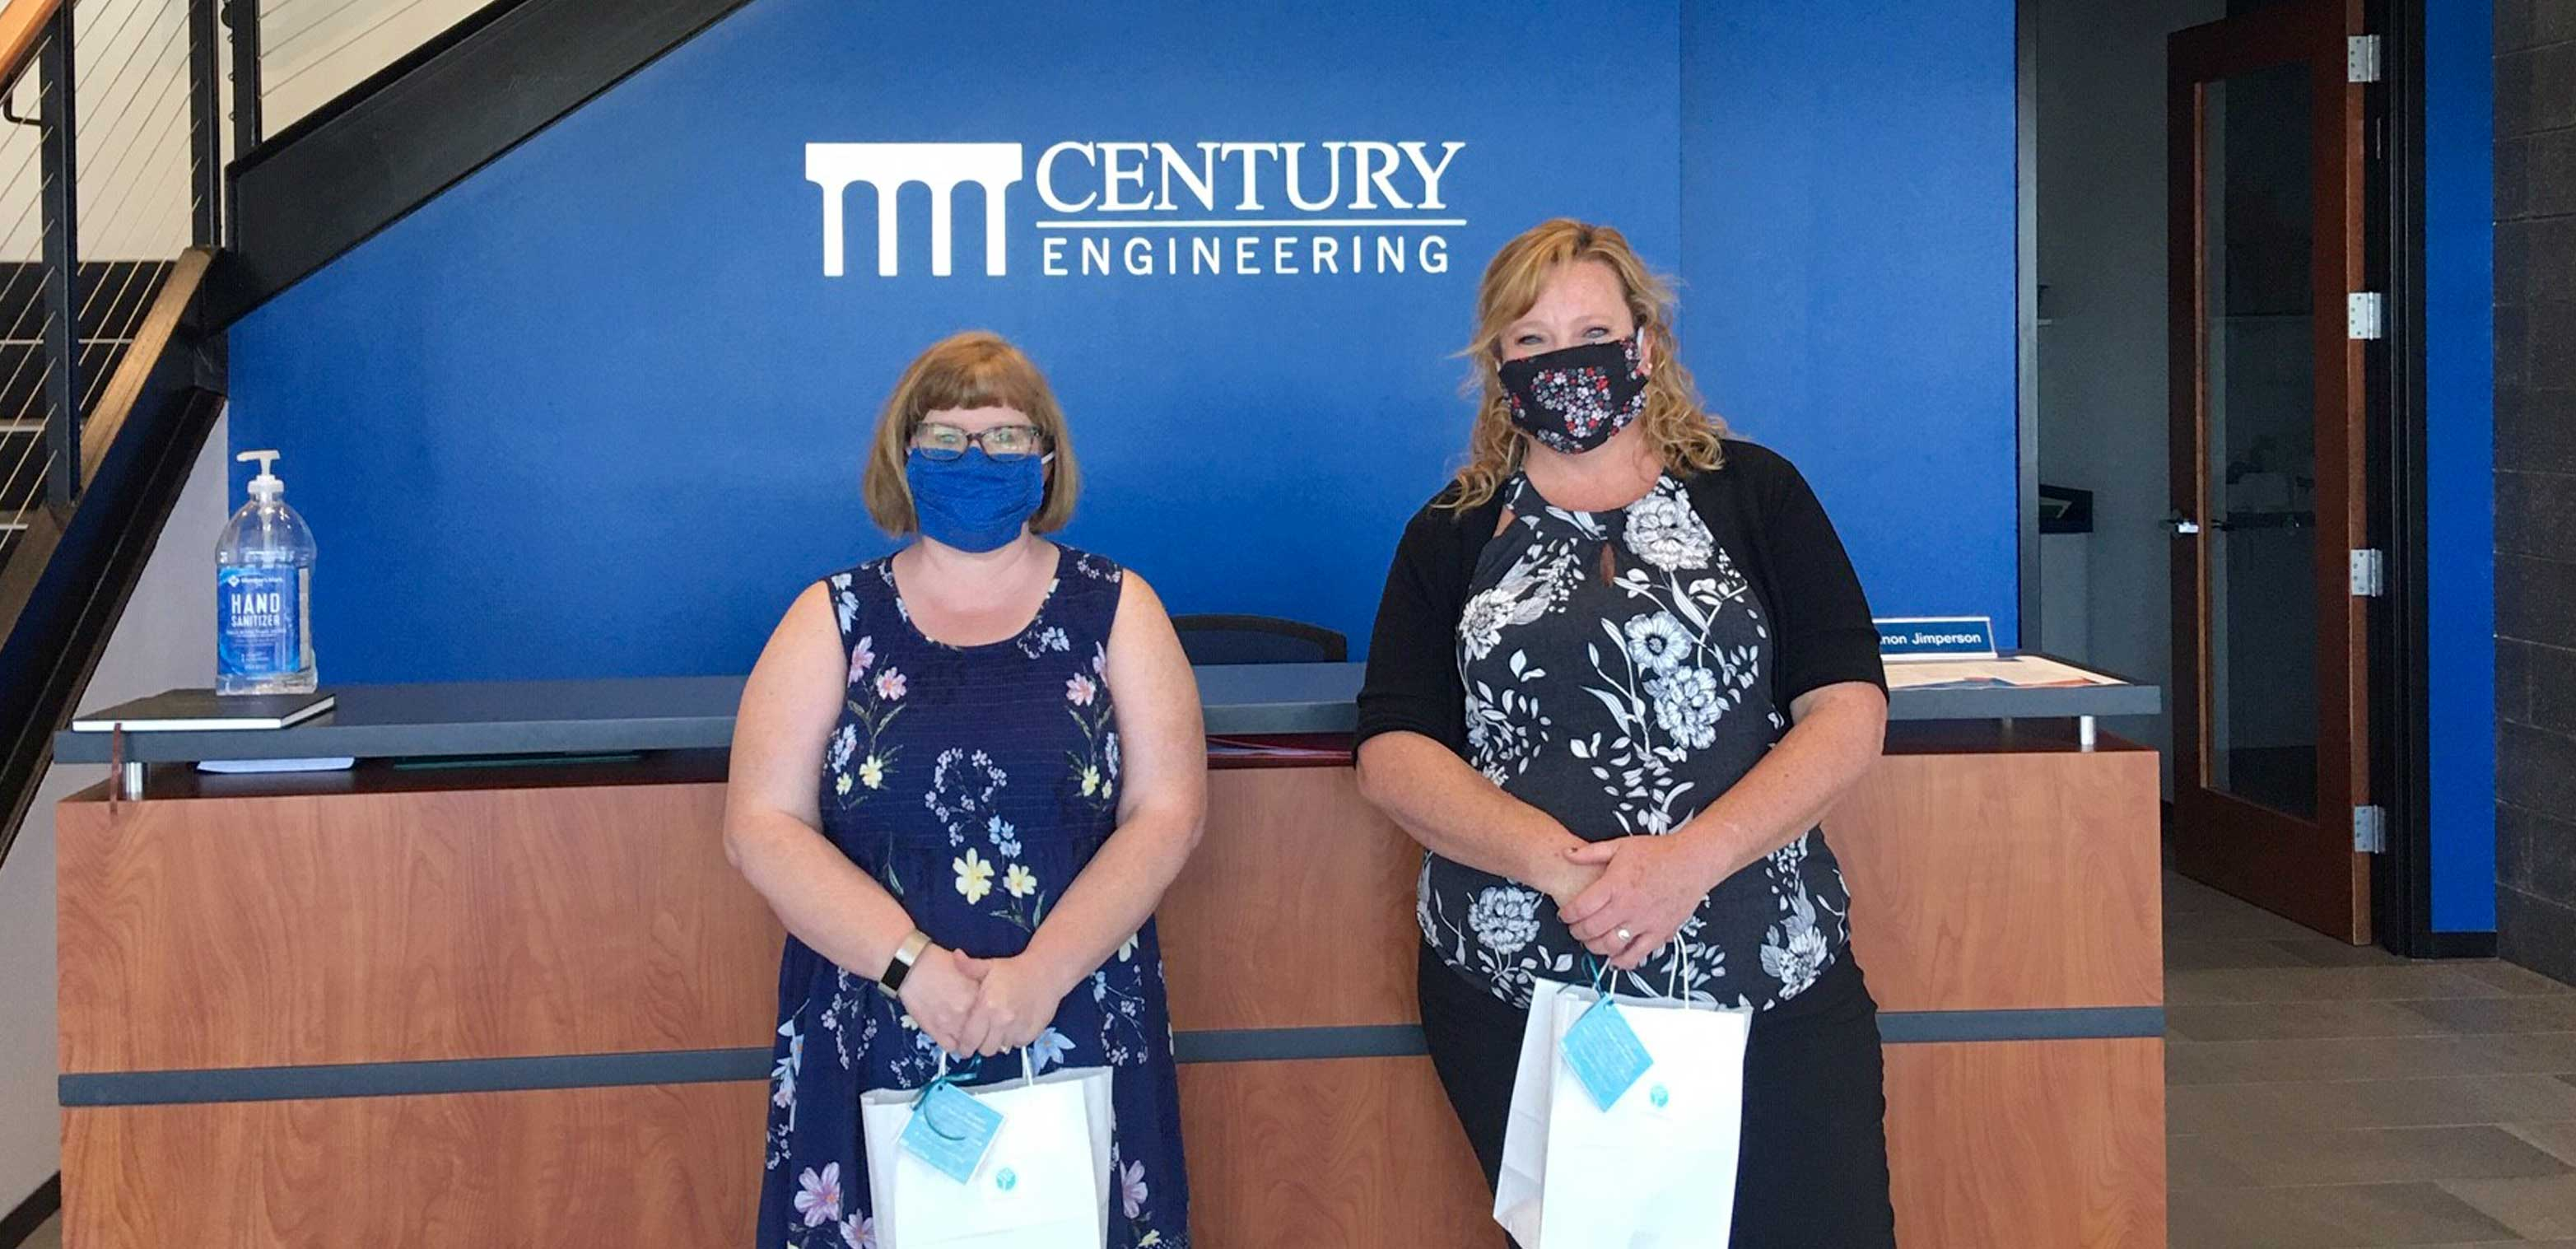 Christina Kilpatrick and Tina Baily of Century Engineering Inc